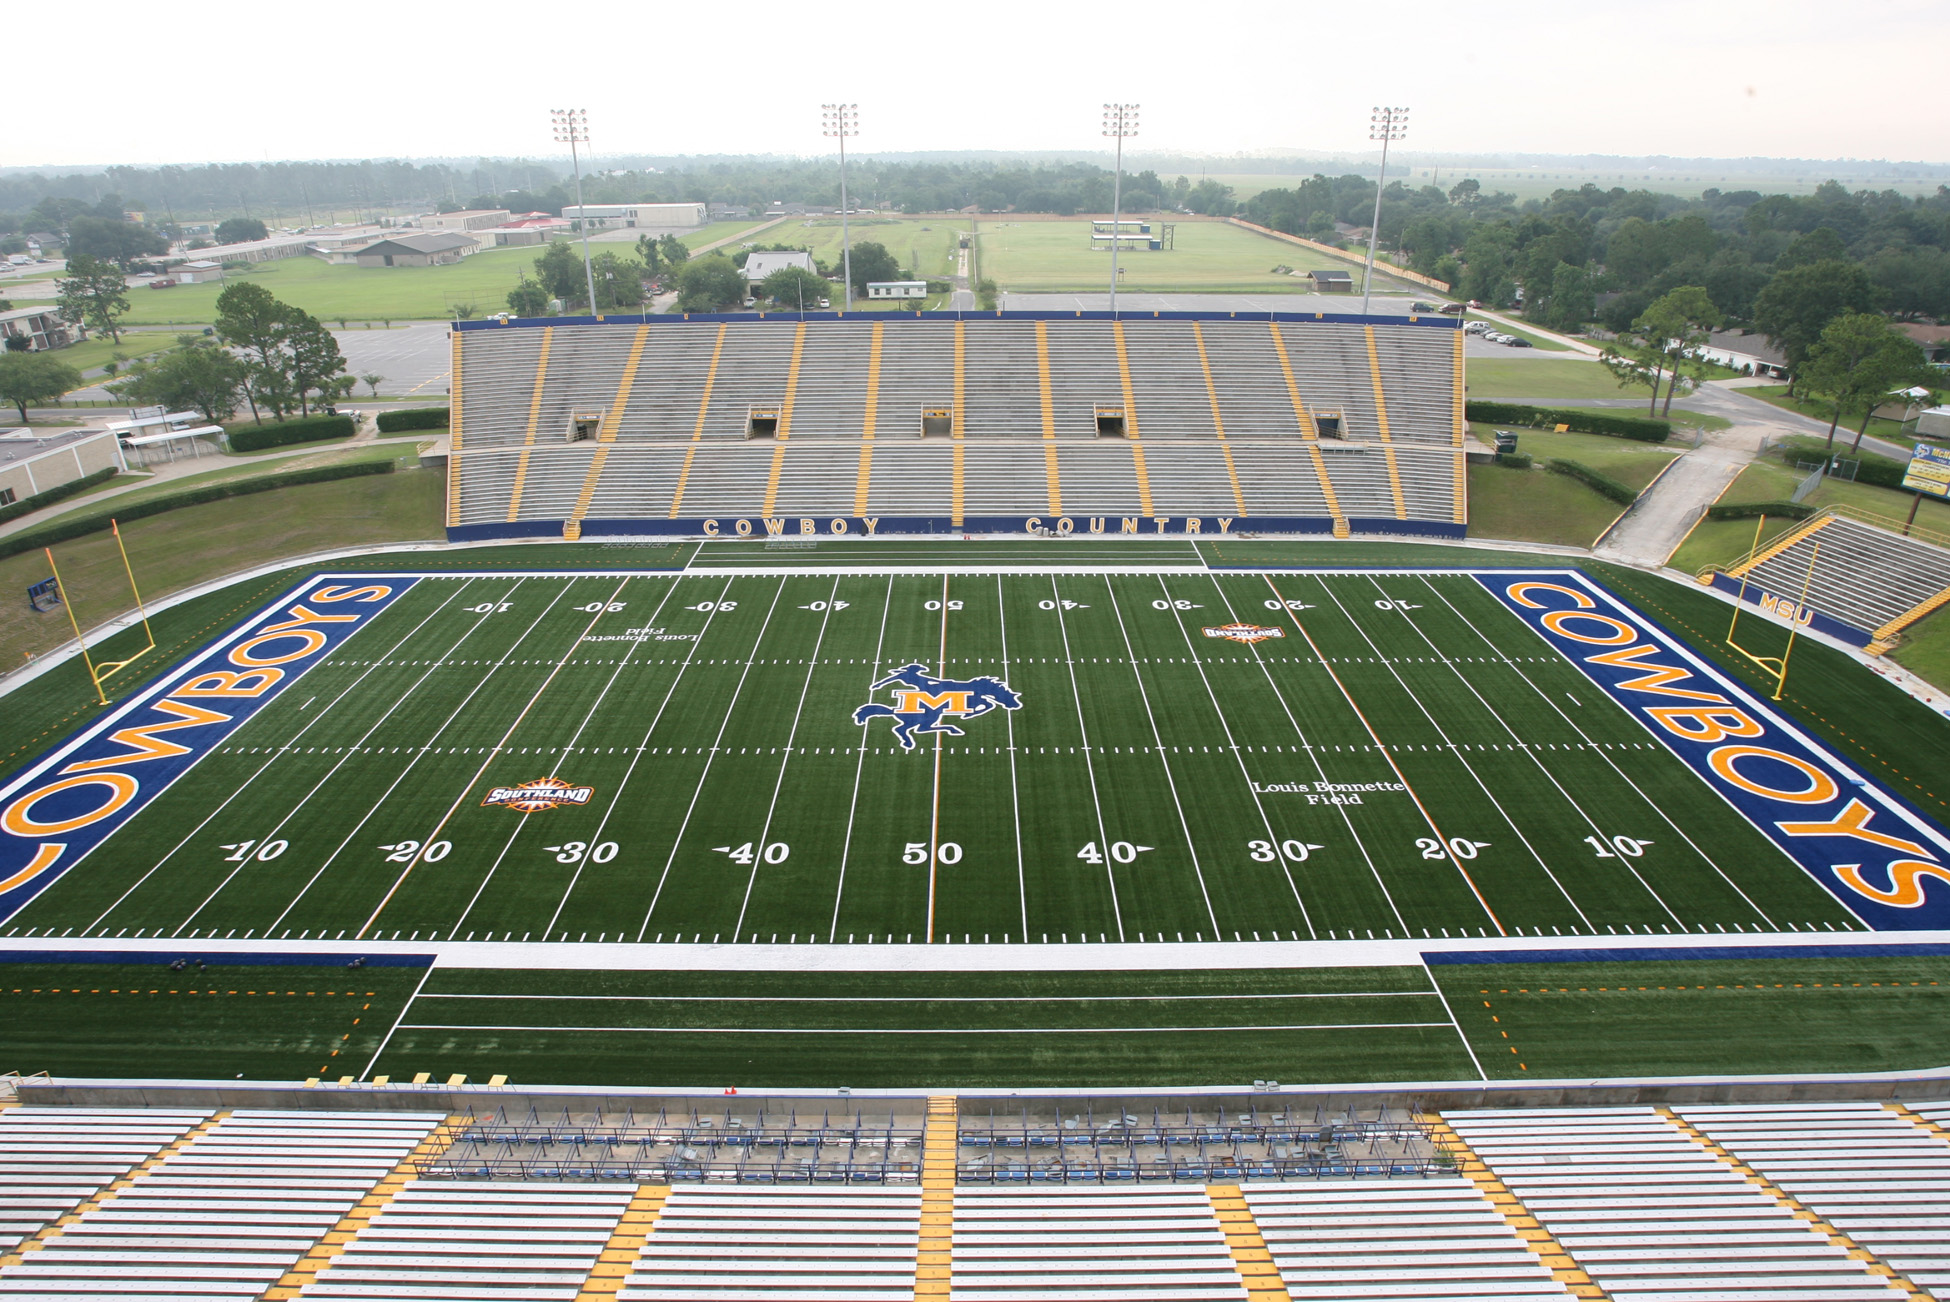 The 16,000-seat Cowboy Stadium at McNeese State University